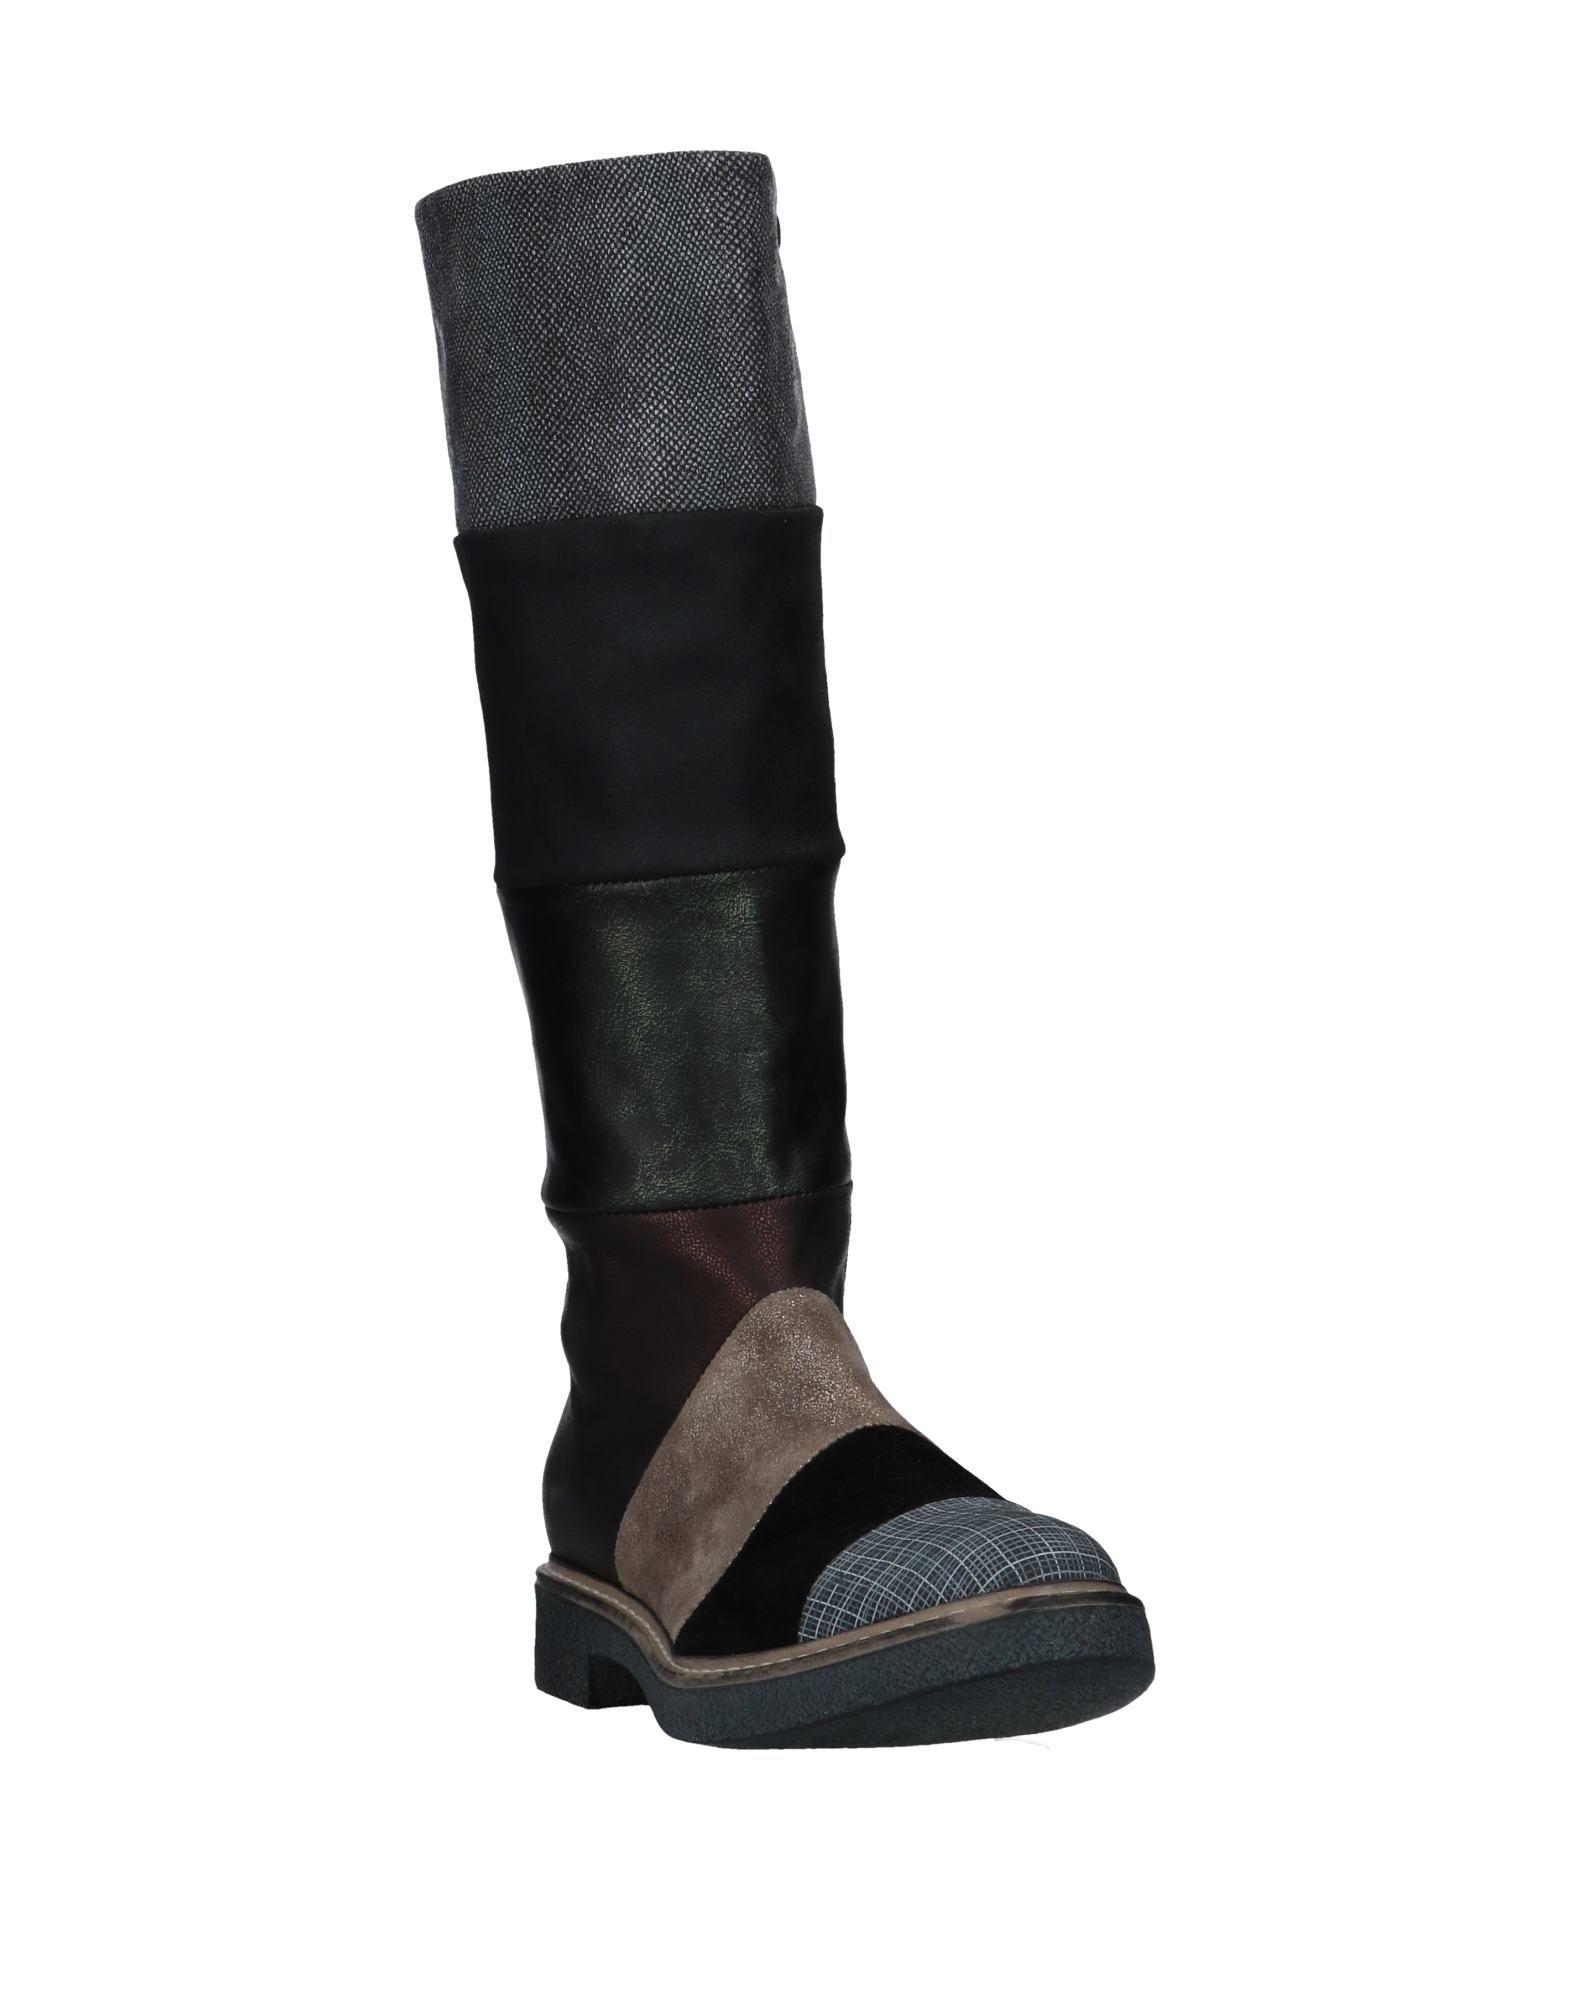 Stilvolle billige Schuhe Damen Ebarrito Stiefel Damen Schuhe  11521165CS ef7bbe